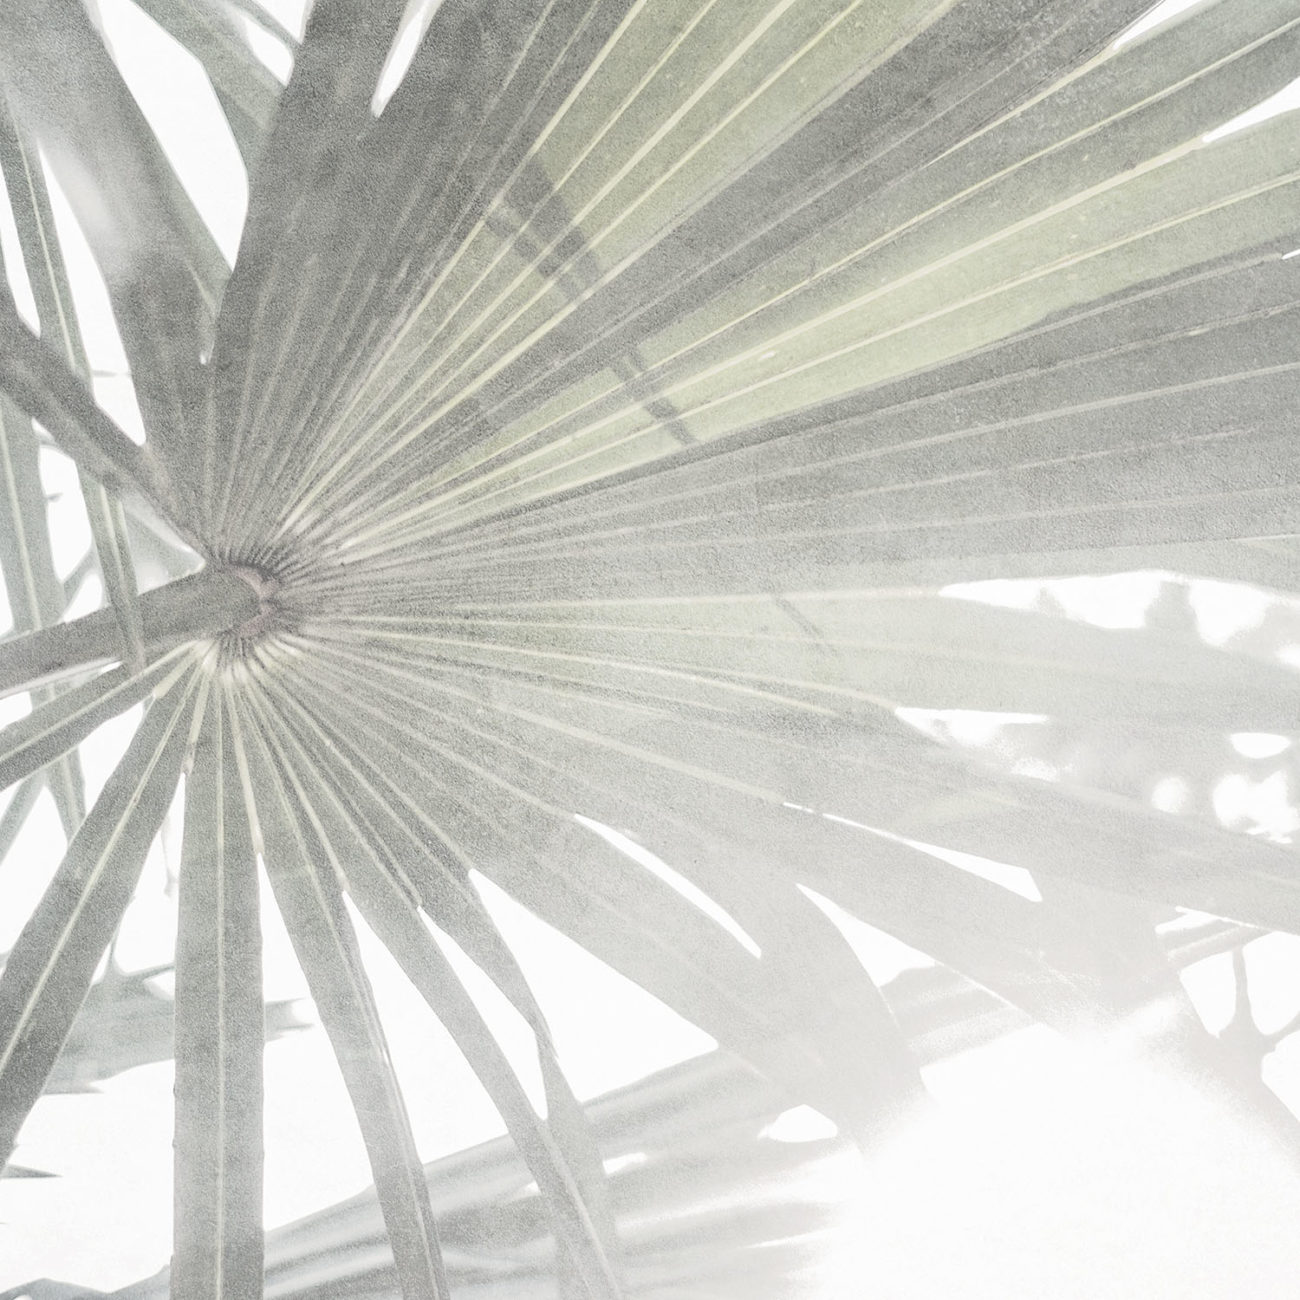 Sabal palm leaf, Study II, Florida, 2019